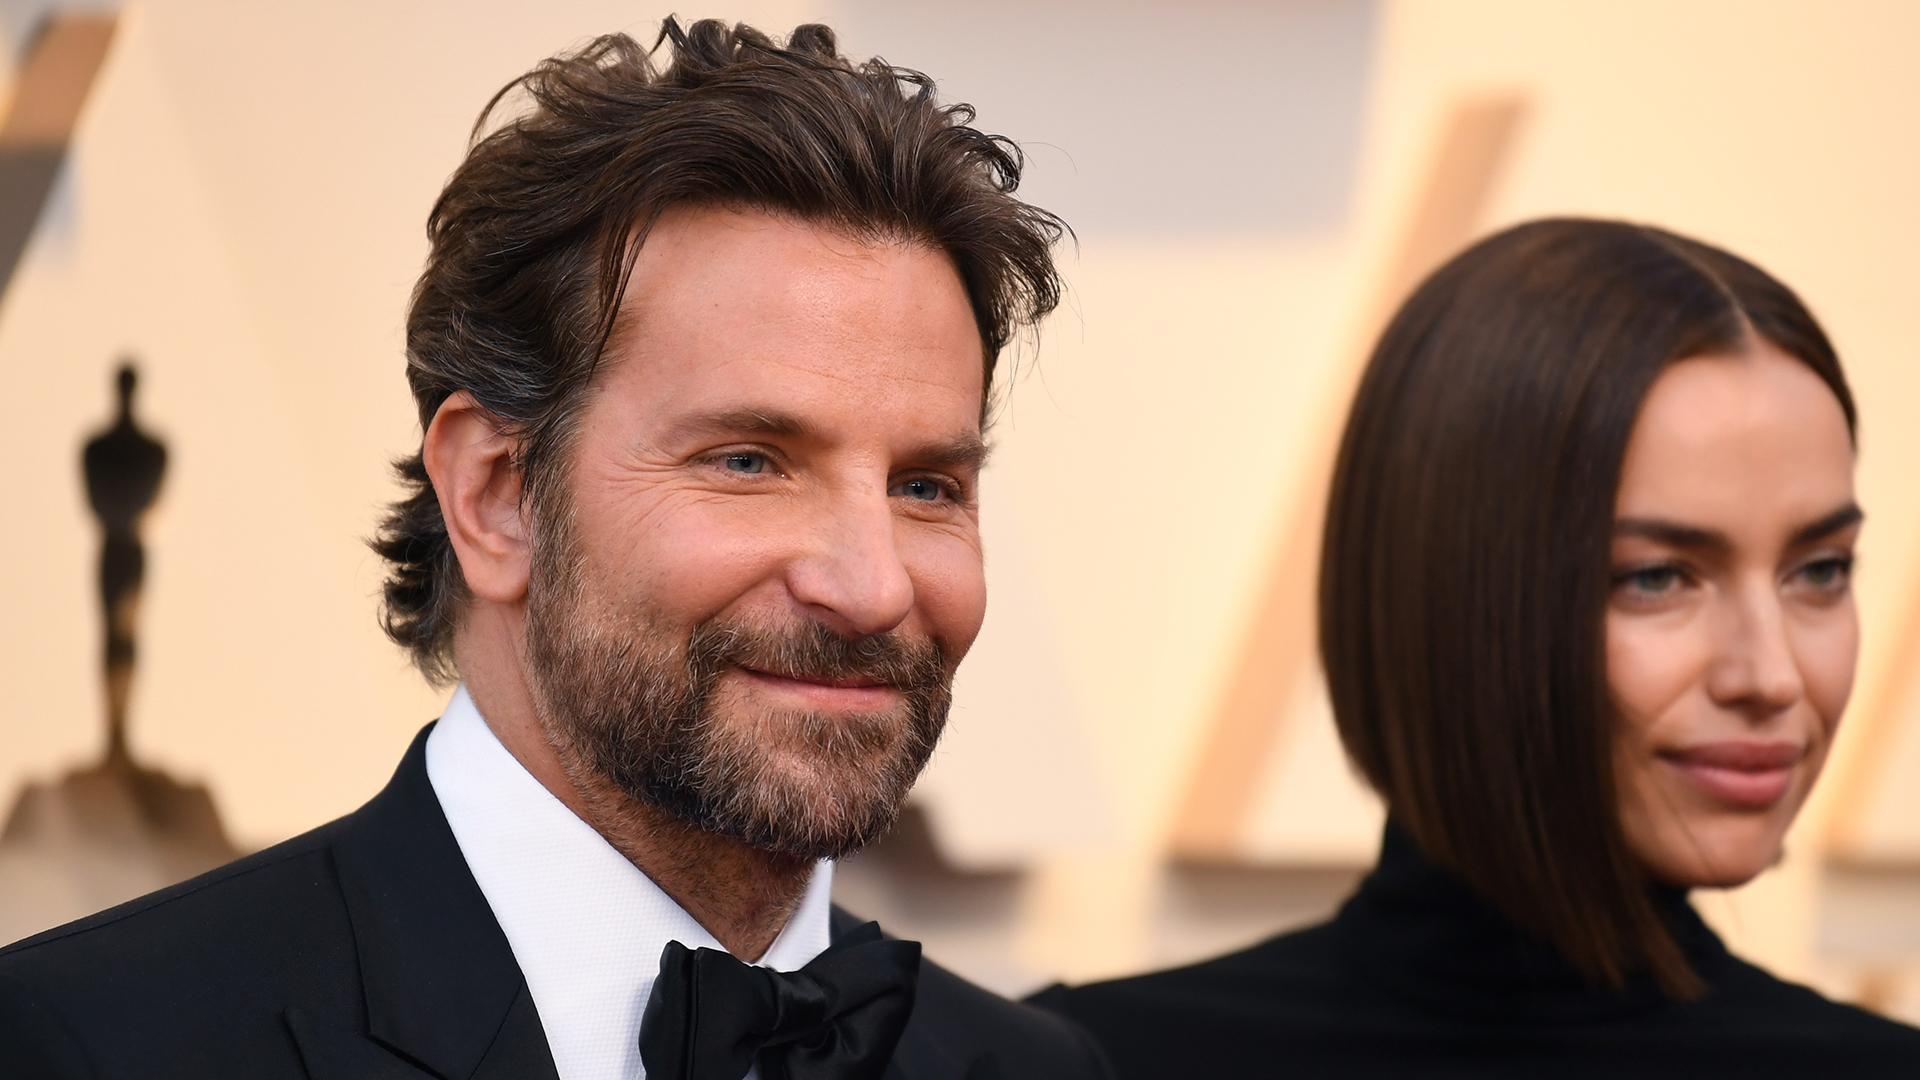 Bradley Cooper Irina Shayk Oscars 2019 Photos Bradley Cooper Oscars 2019 Date Stylecaster